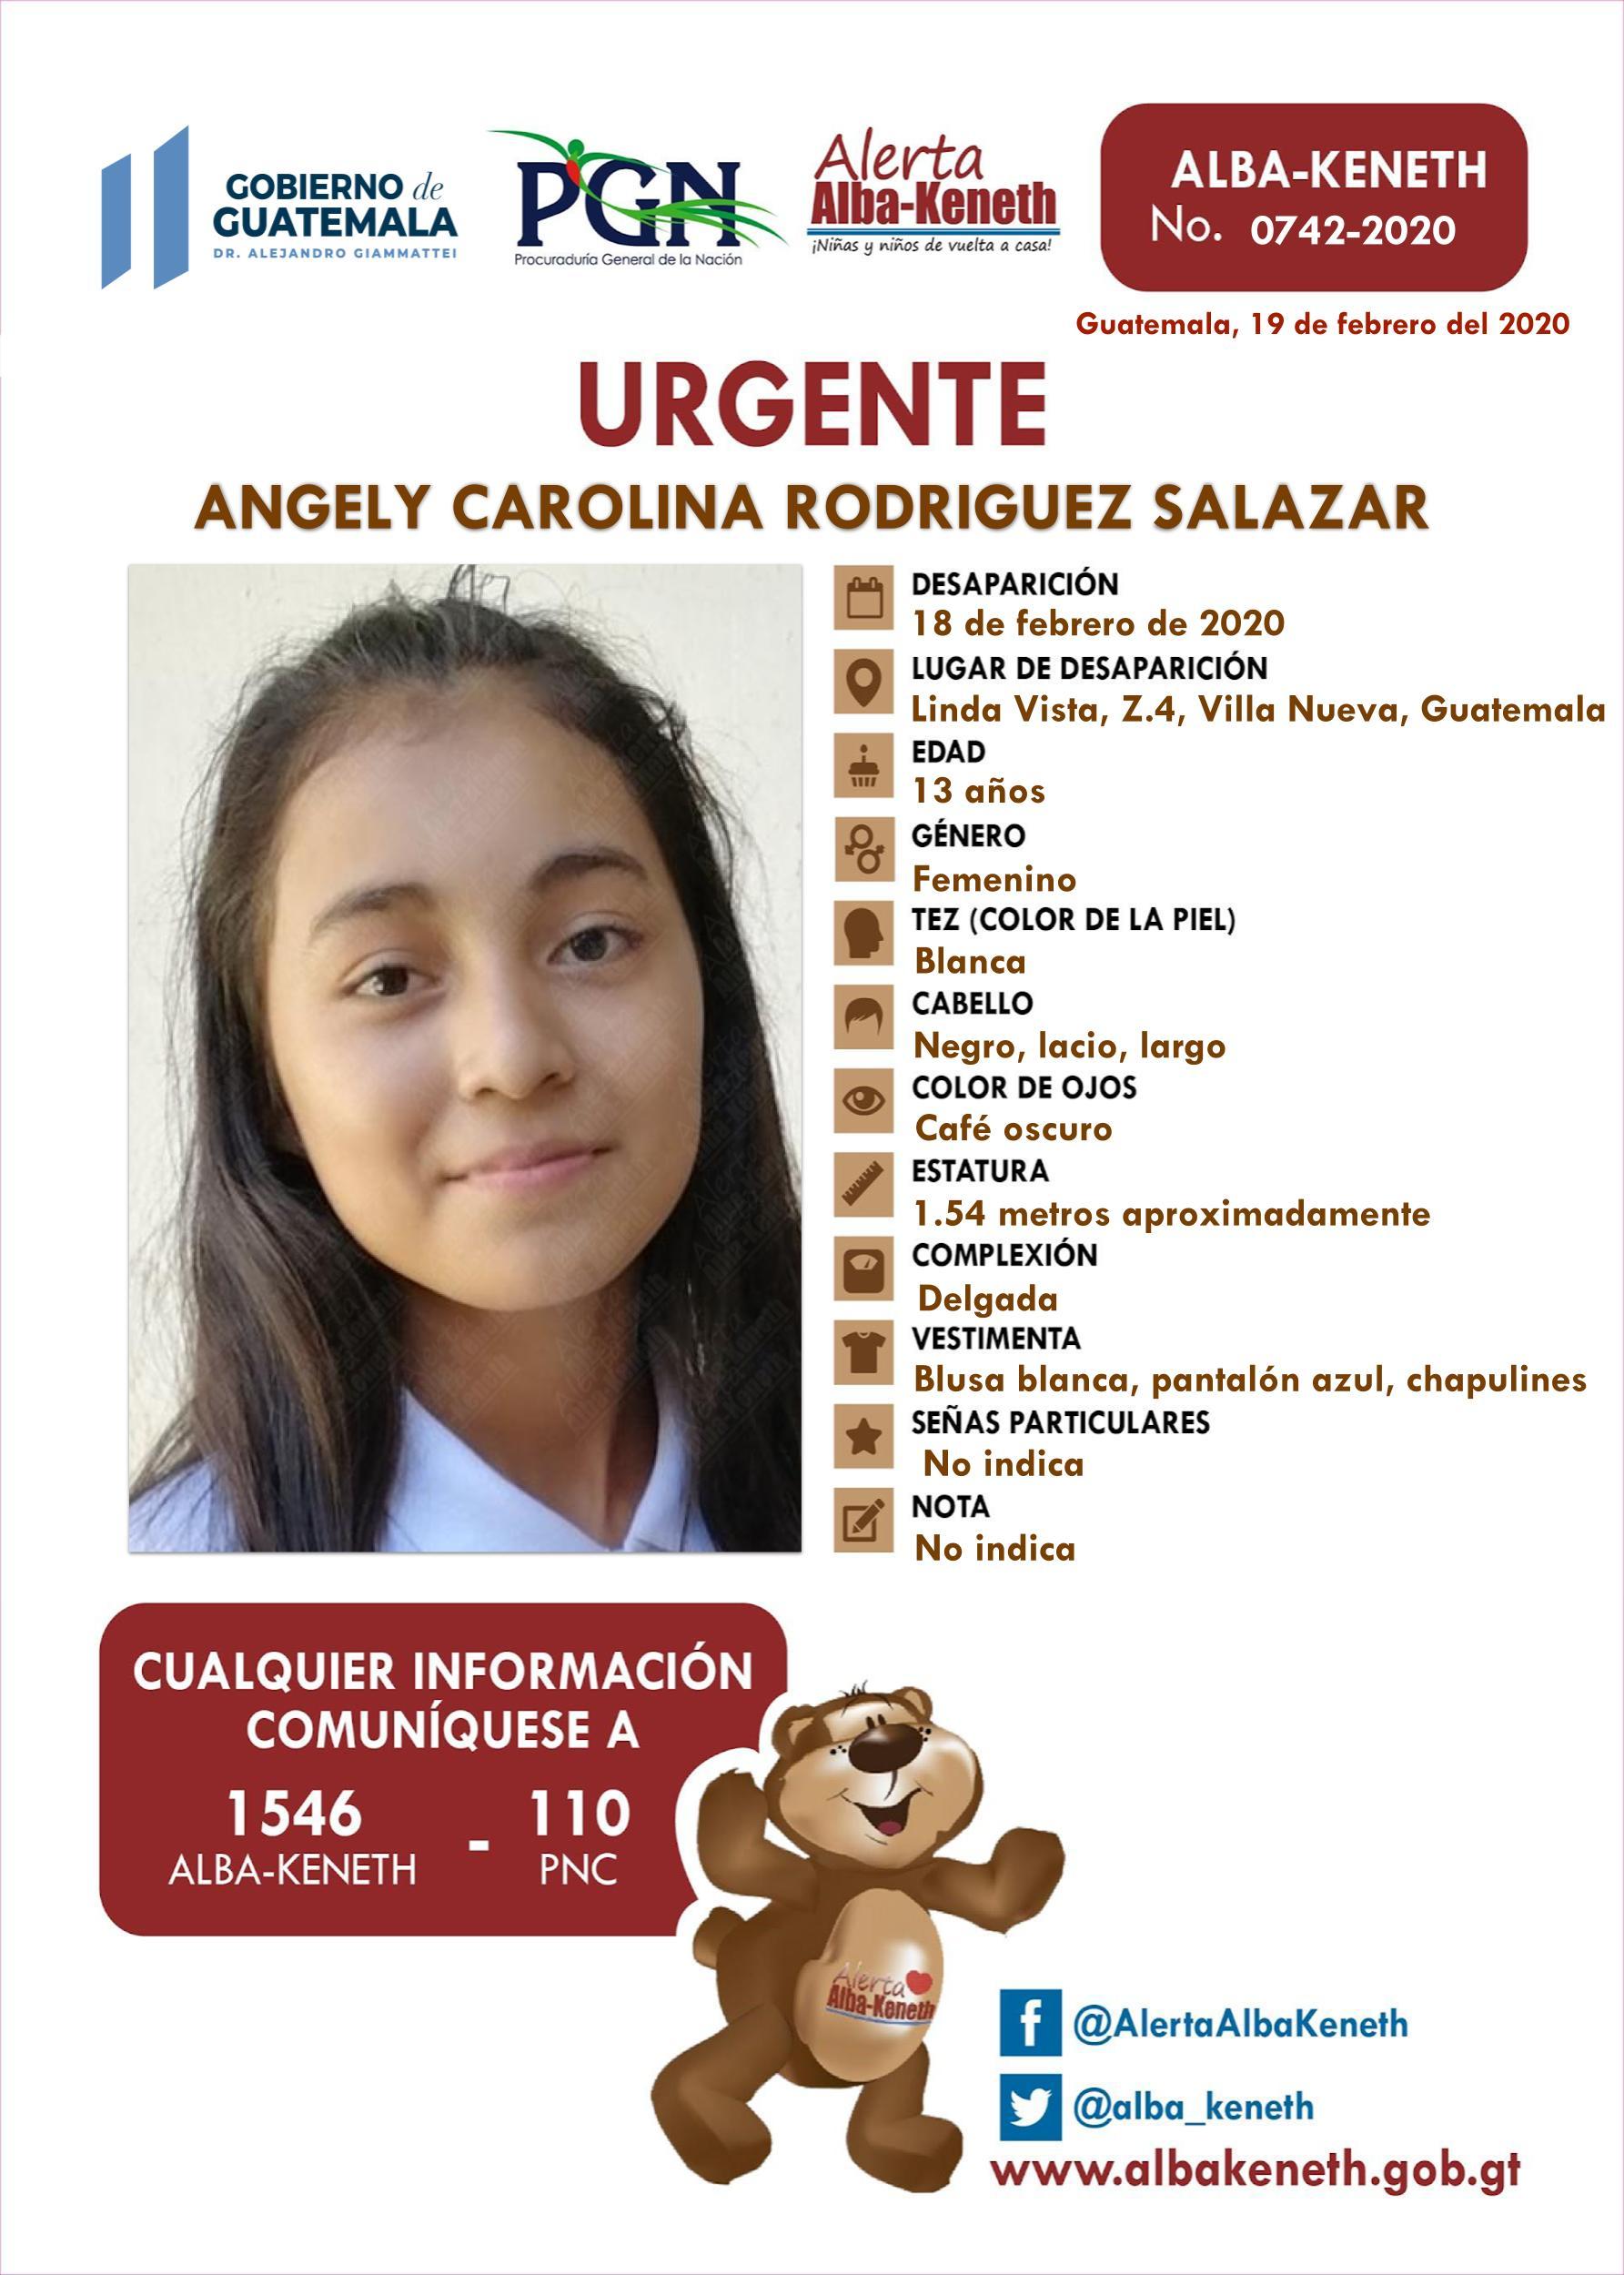 Angely Carolina Rodriguez Salazar